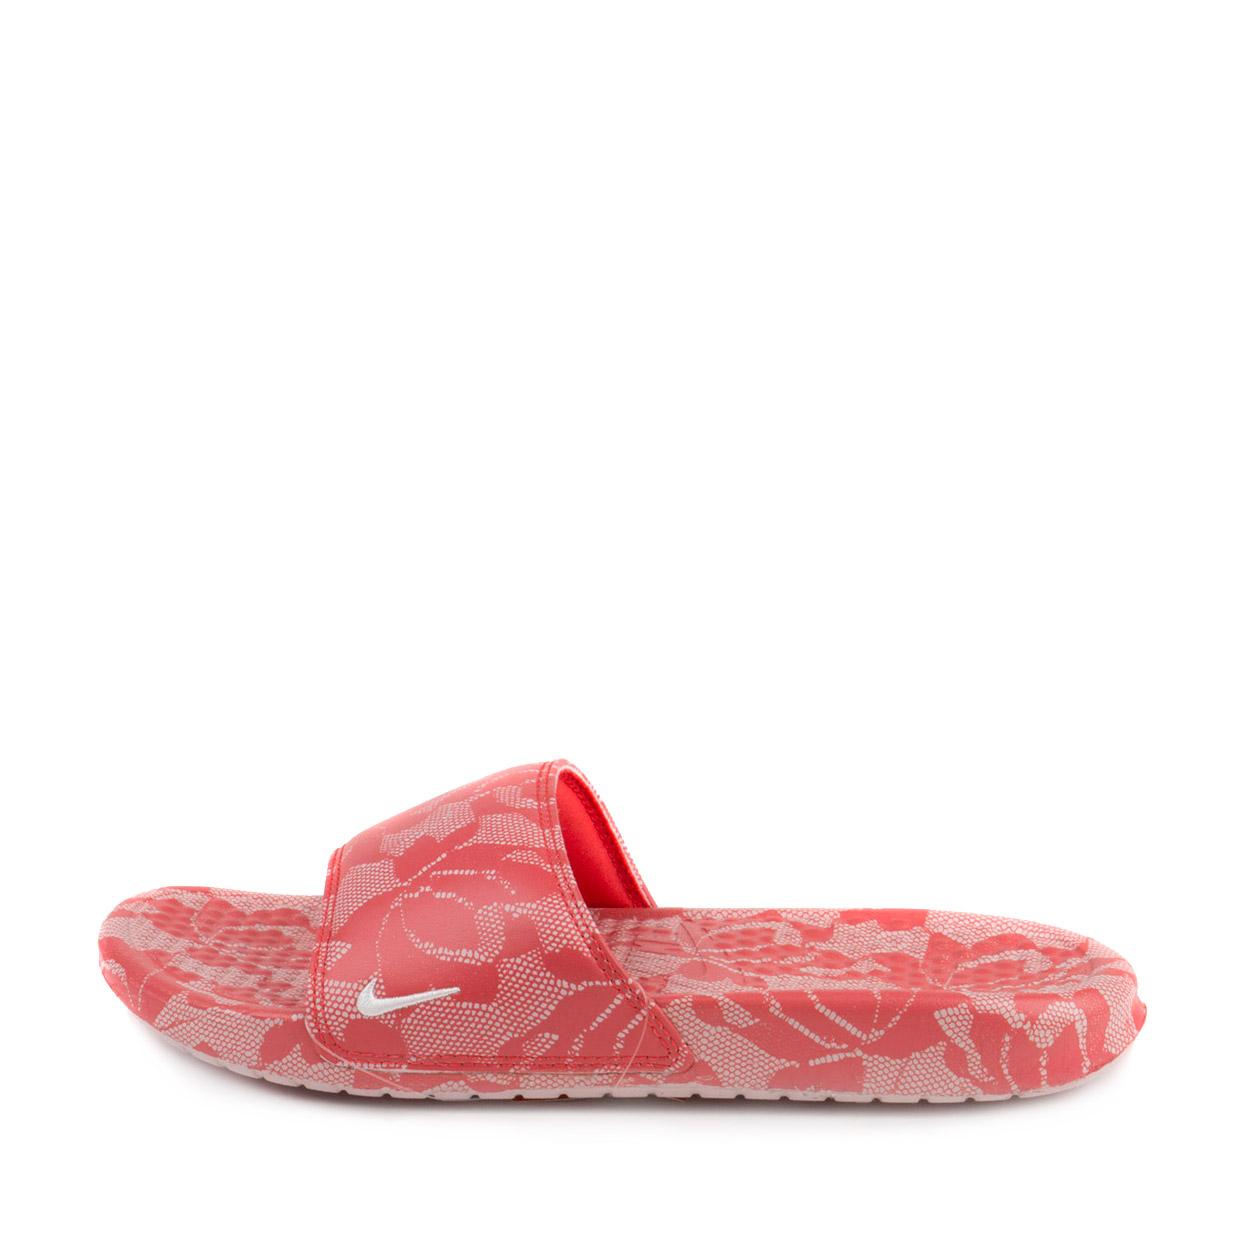 Nike Womens LAB WMNS Benassi SP Light Crimson/White-Champagne 789565-616 -  Walmart.com